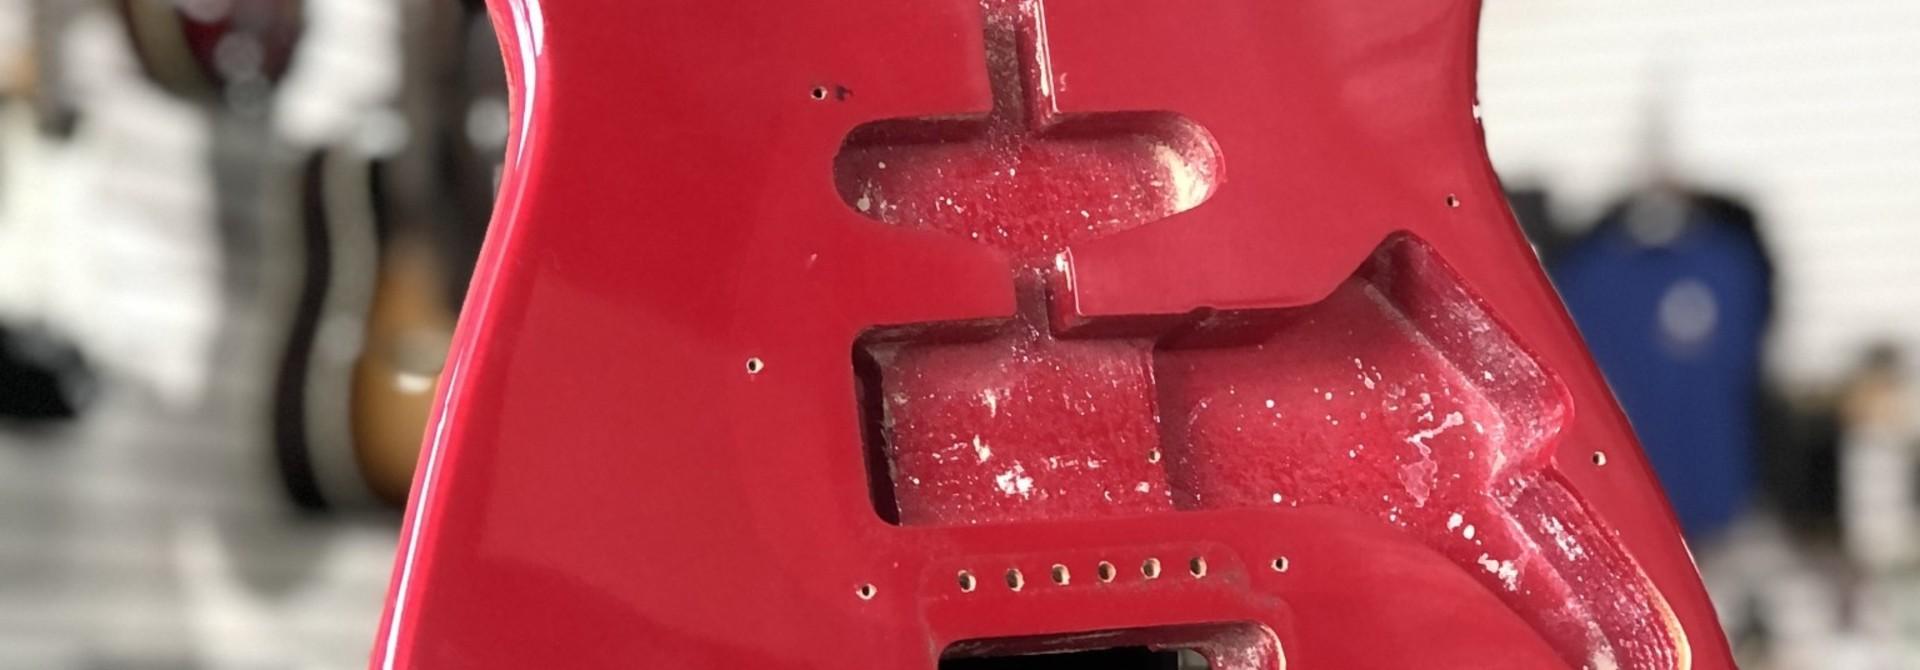 Red Squire Stratocaster Body